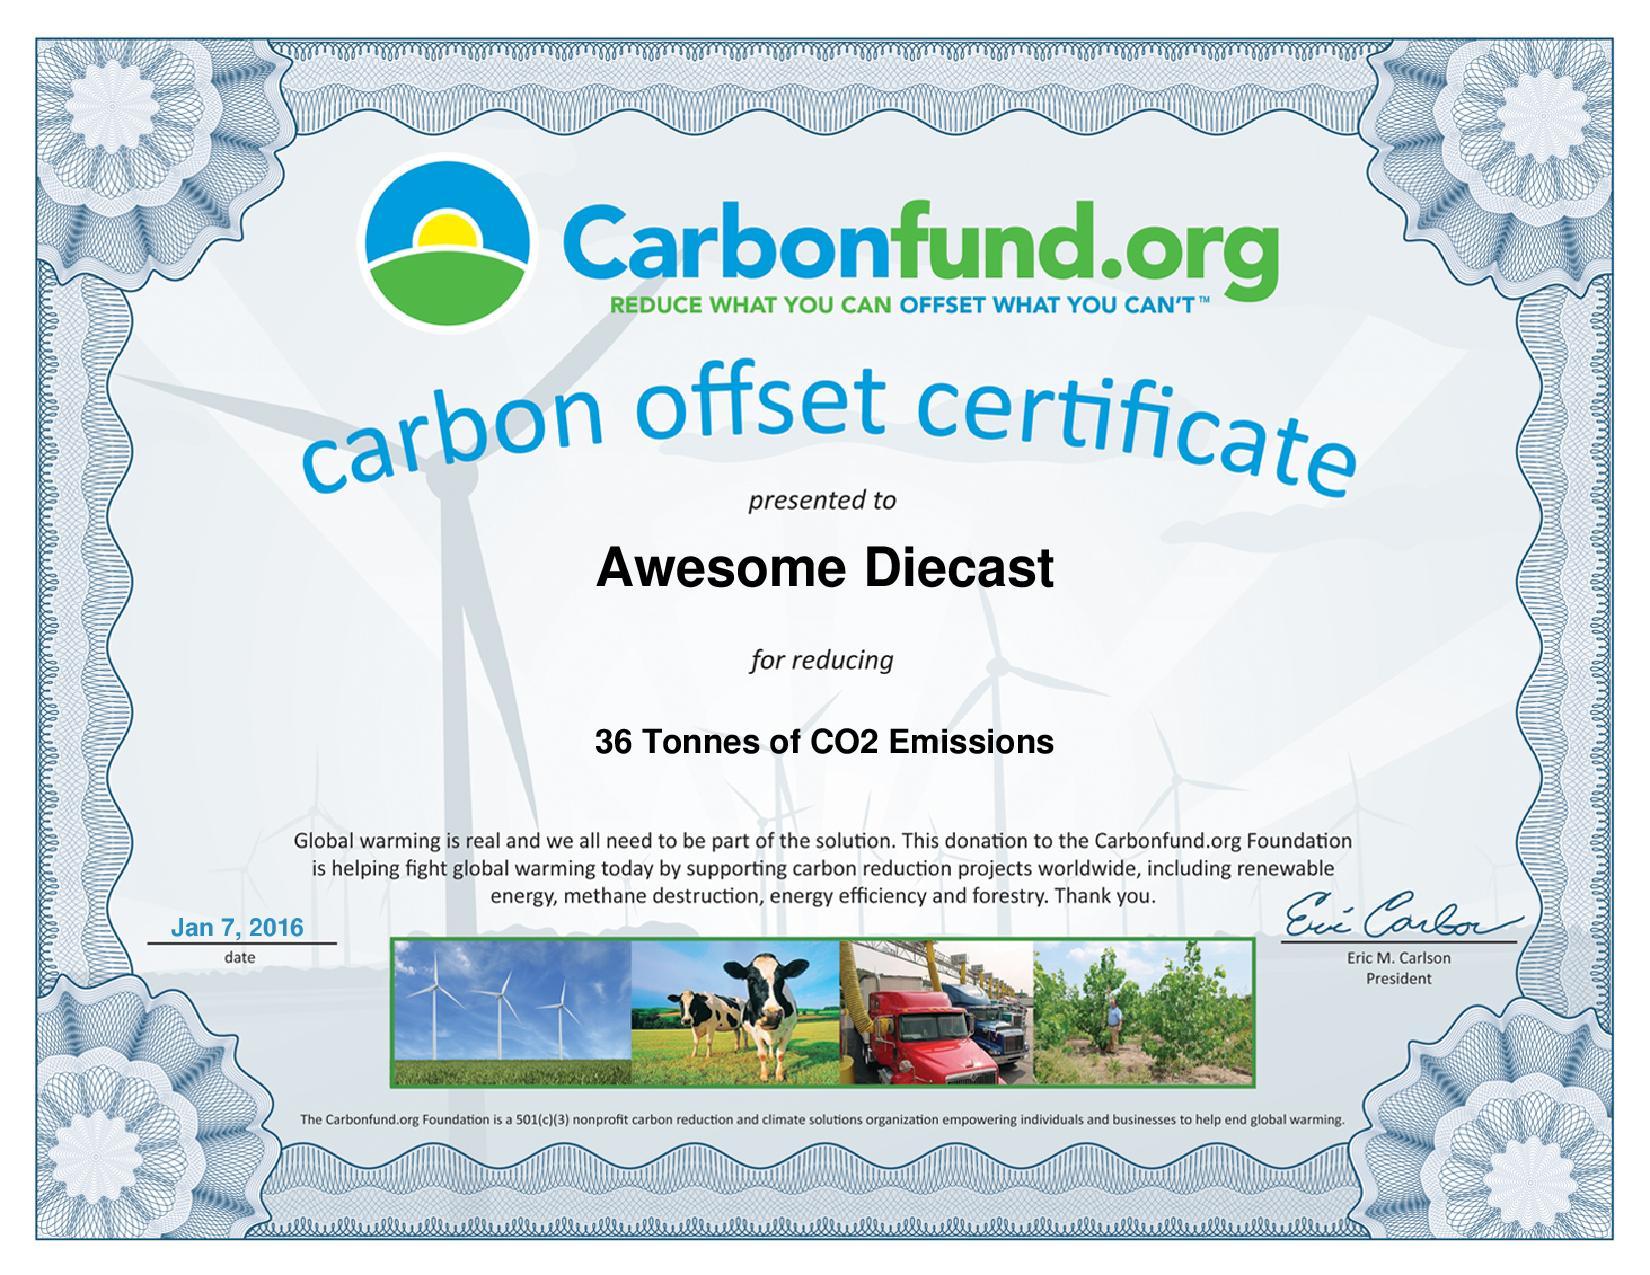 carbonfundorg-certificate-page-001-1-.jpg